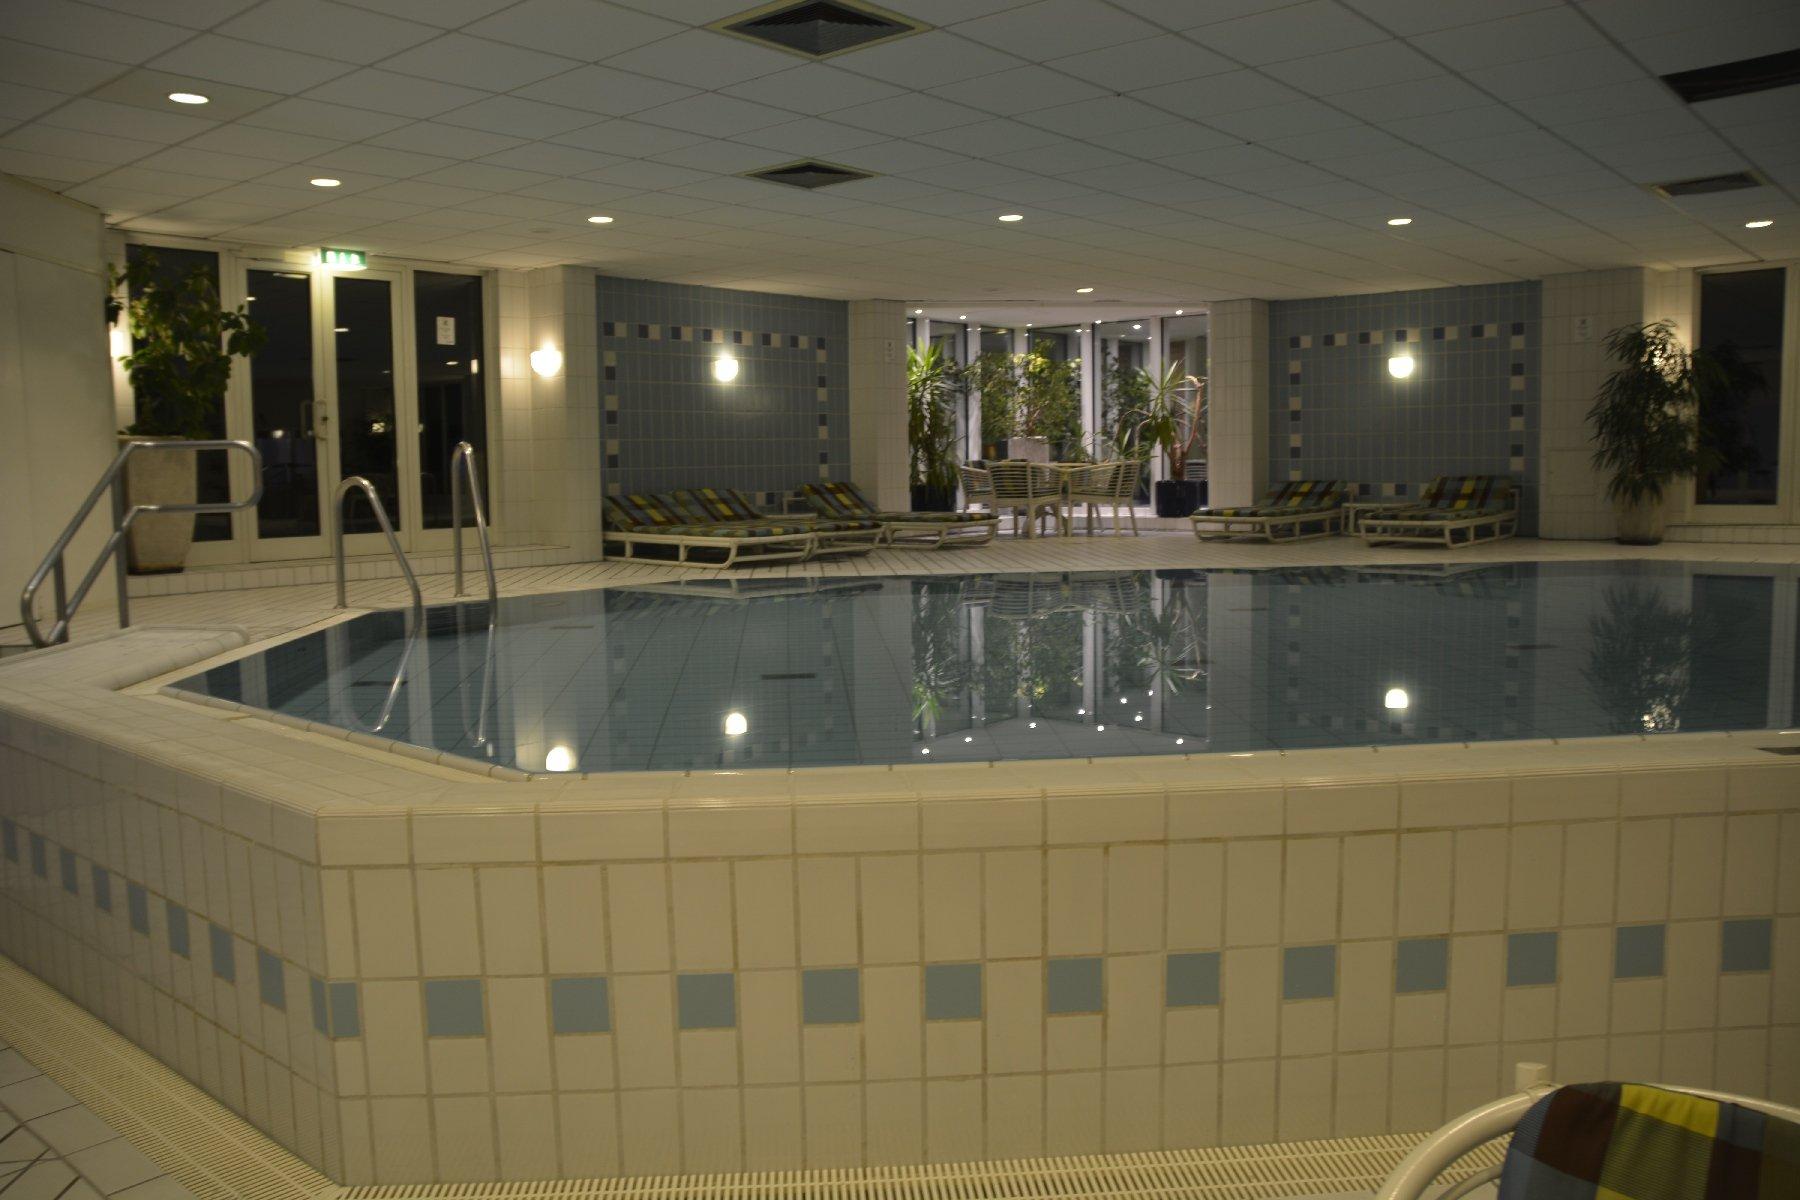 Pool karlsruhe kunst schwimmbad und saunen - Pool karlsruhe ...